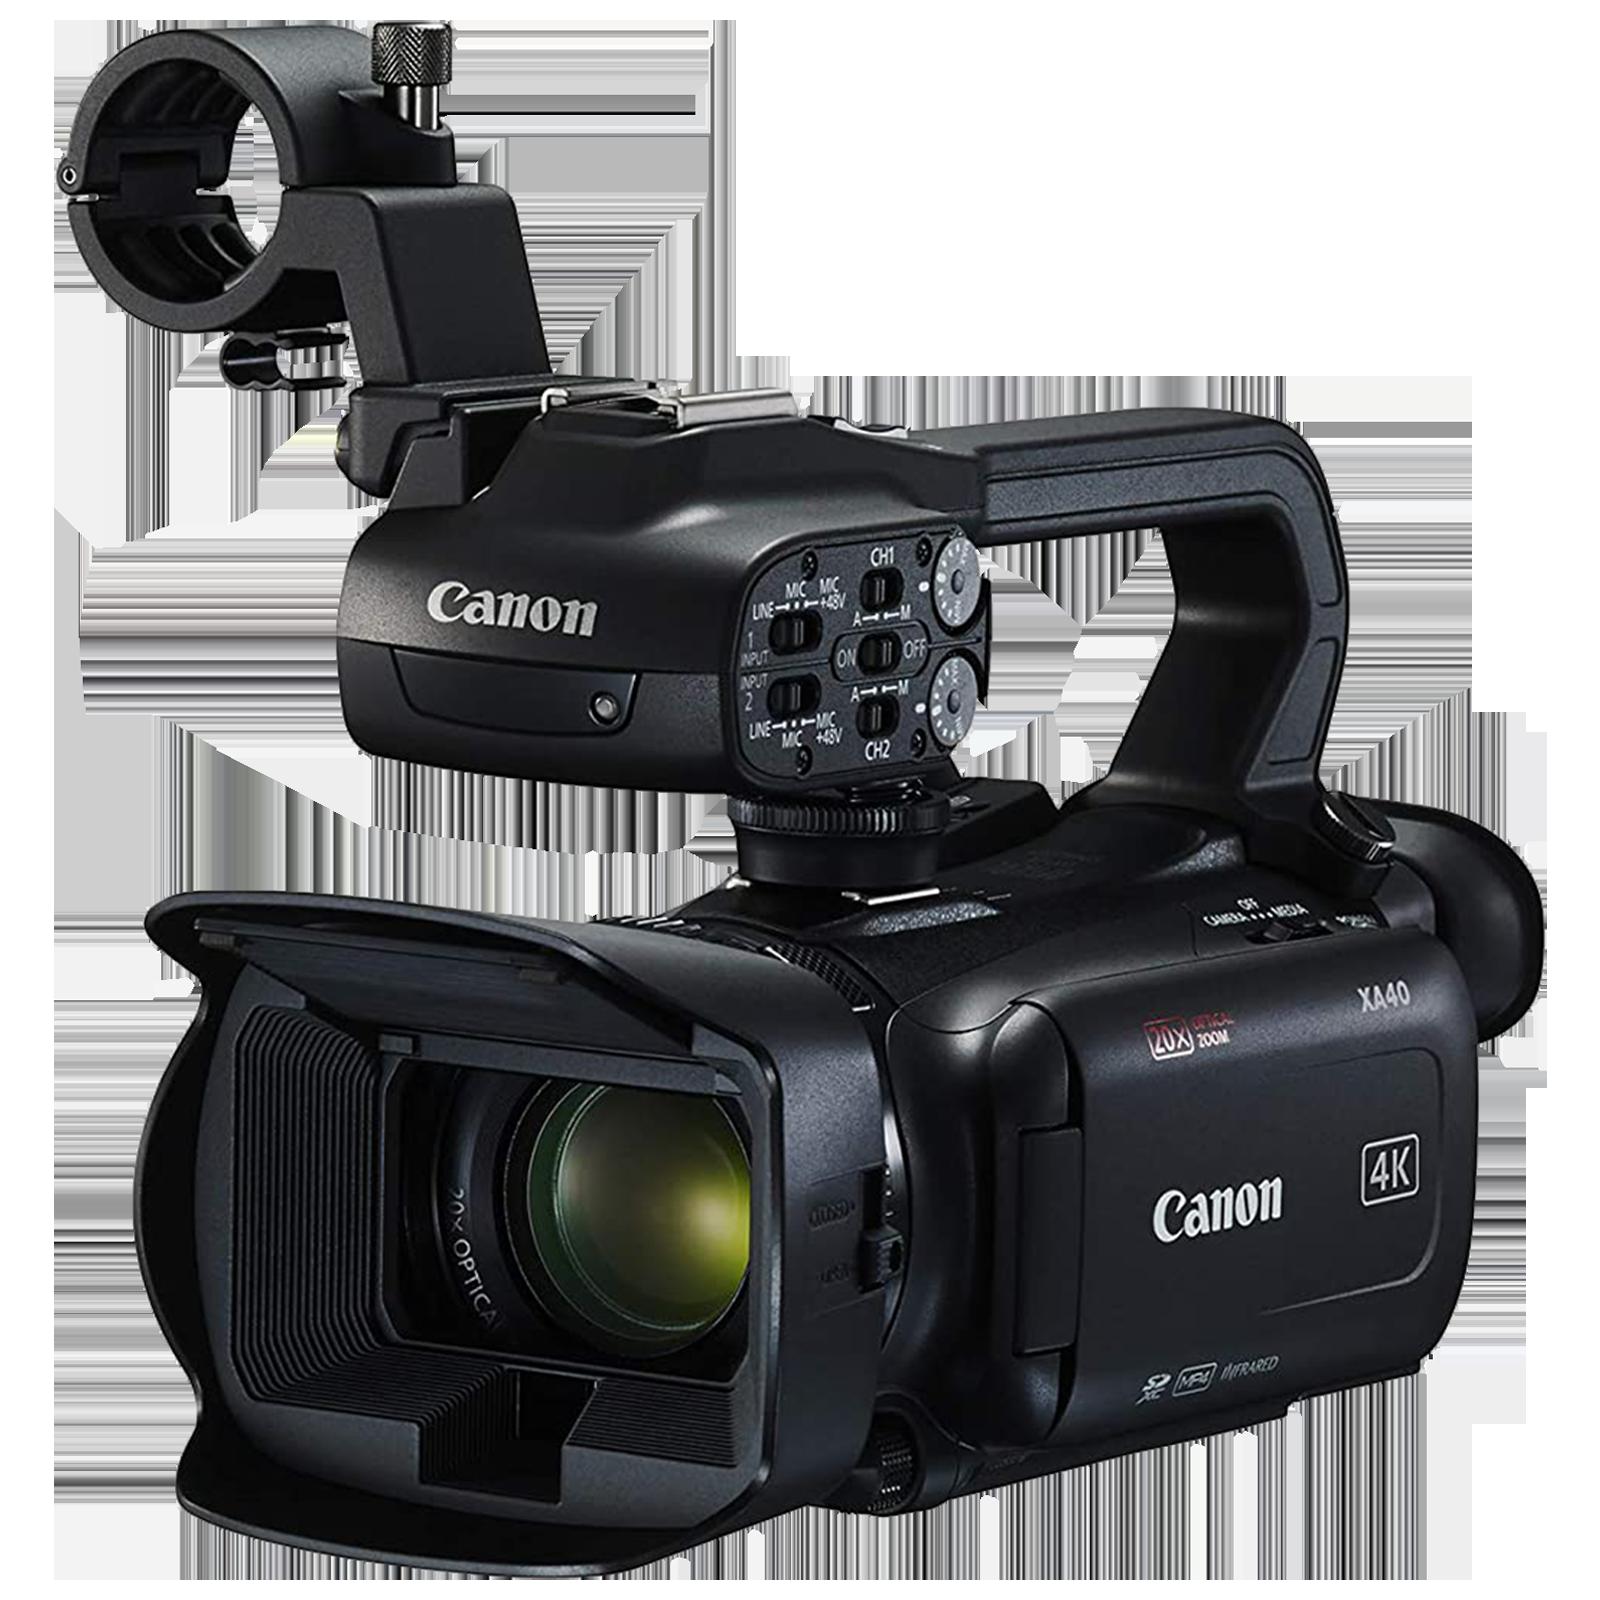 Canon XA40 8.29 MP Camcorder (20x Optical Zoom, LCD Touchscreen, 3666C003-C01, Black)_1